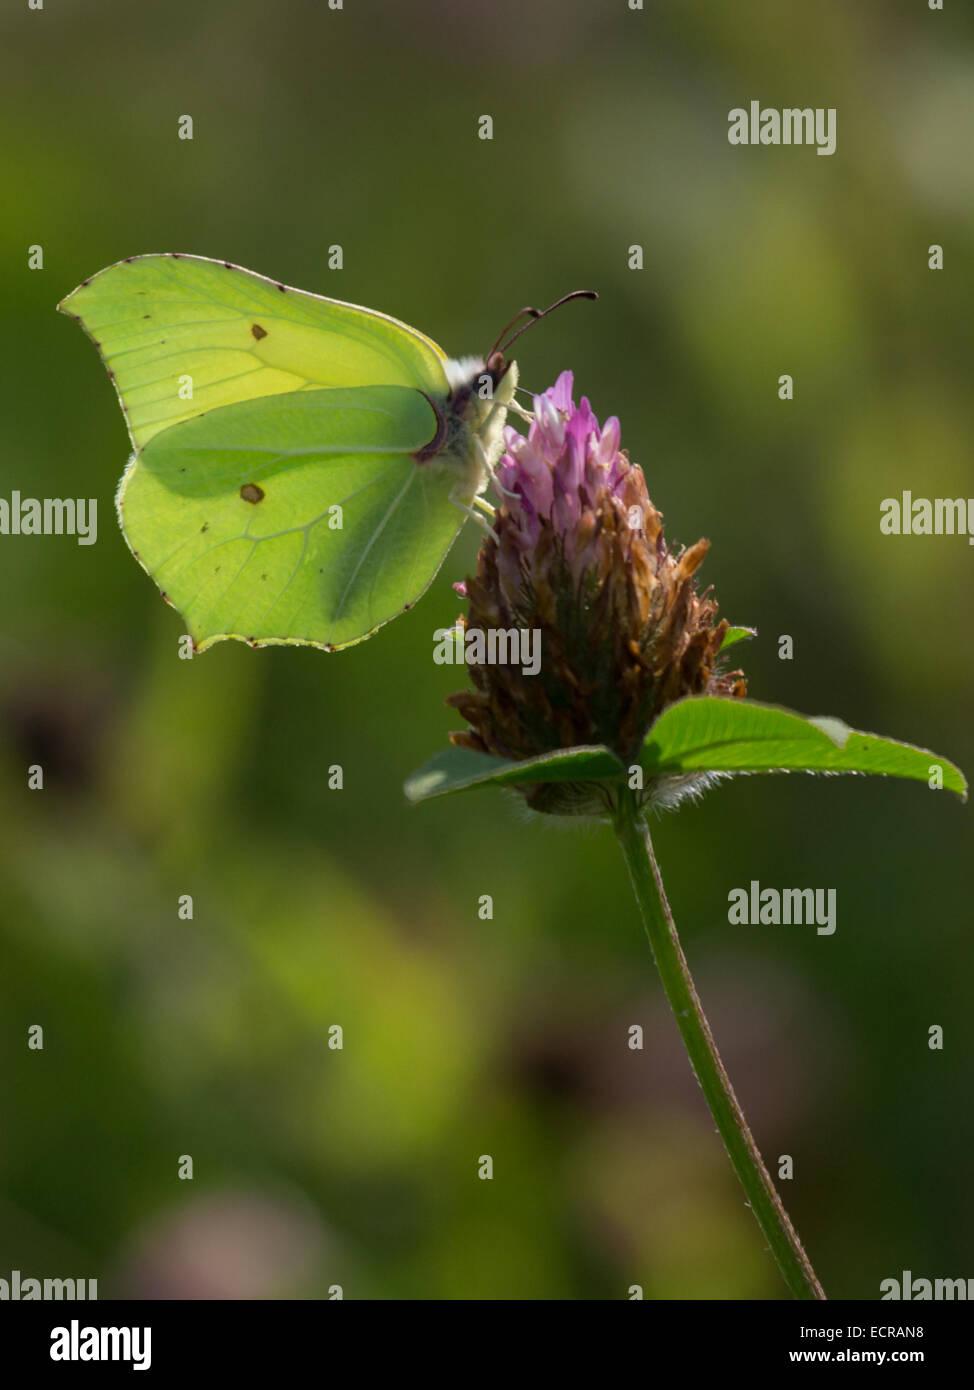 The Brimstone Butterfly (Gonepteryx rhamni) On Clover Stock Photo